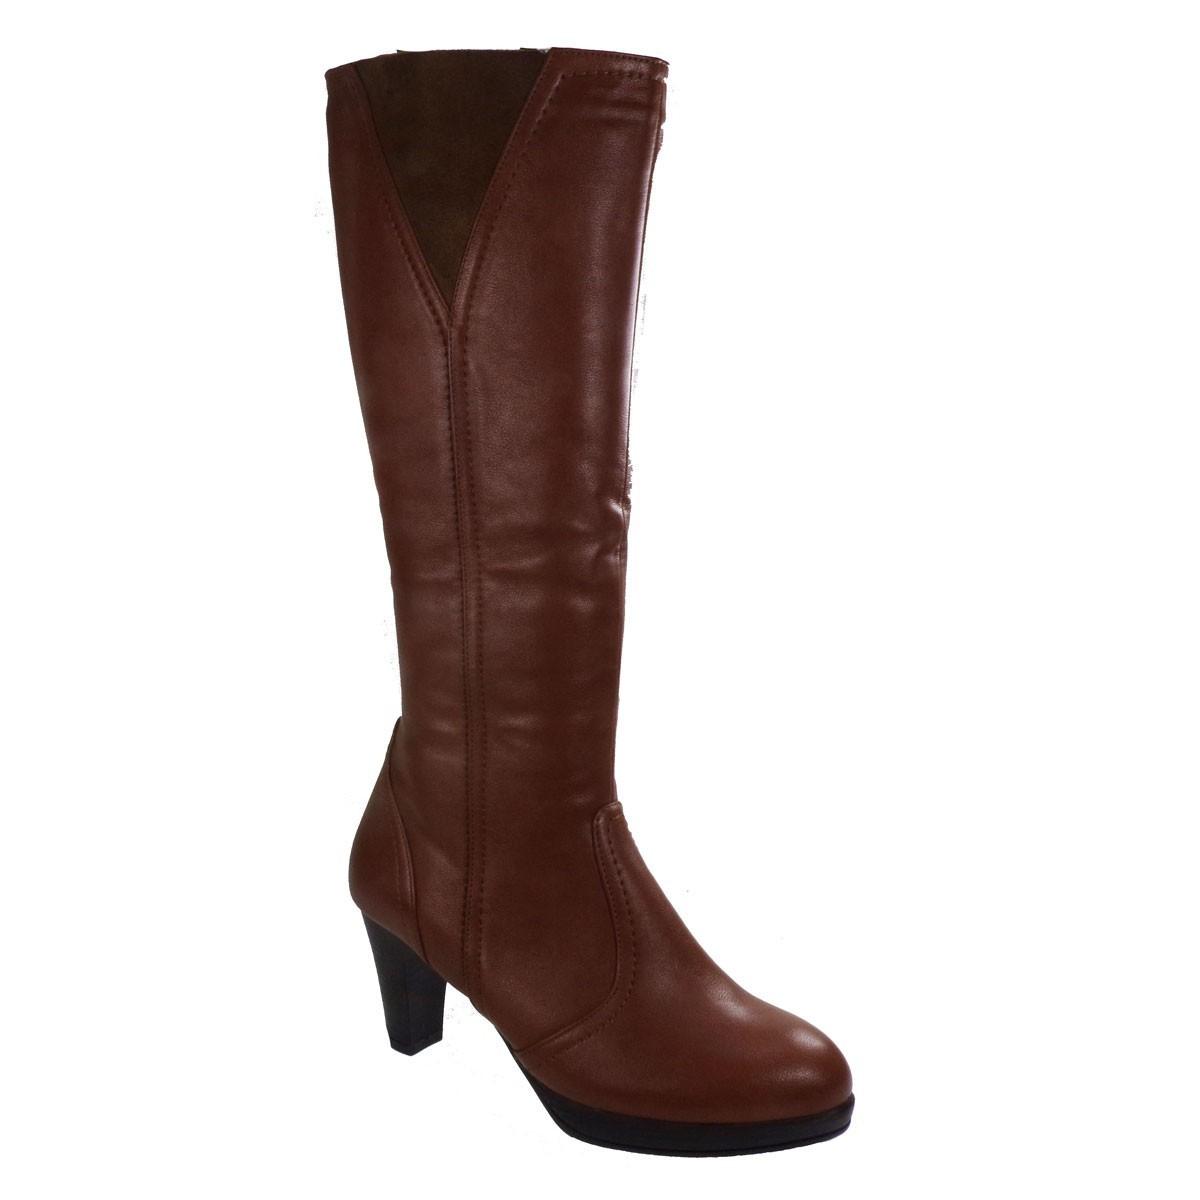 Katia shoes Γυναικεία Παπούτσια Μπότες 79-5098 Ταμπά